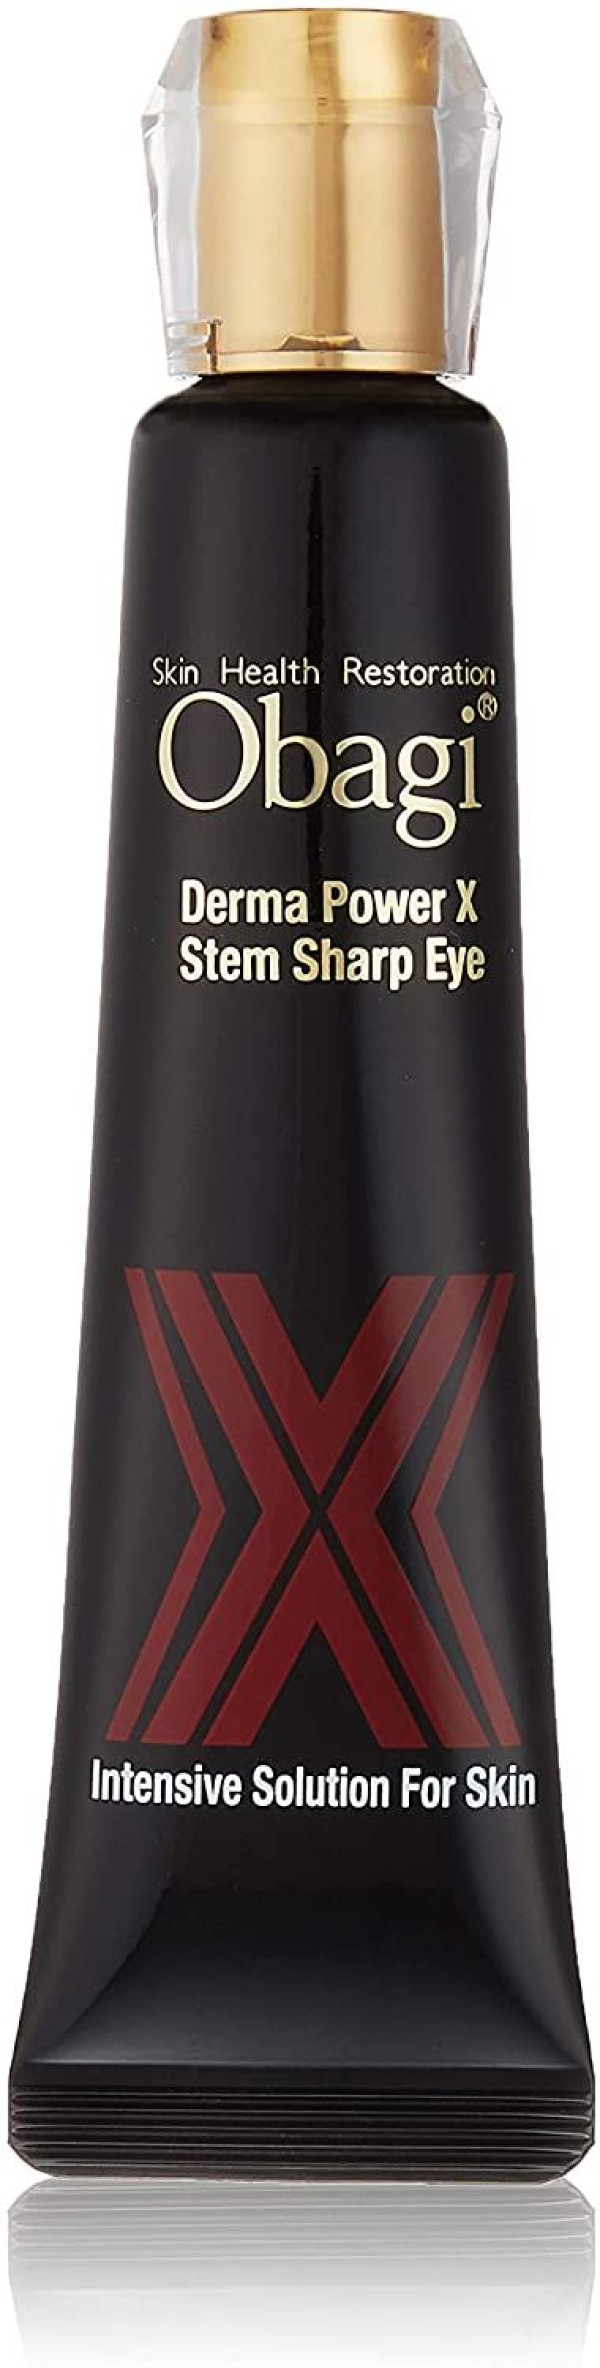 Крем вокруг глаз Obagi Derma Power X Eye Specialist